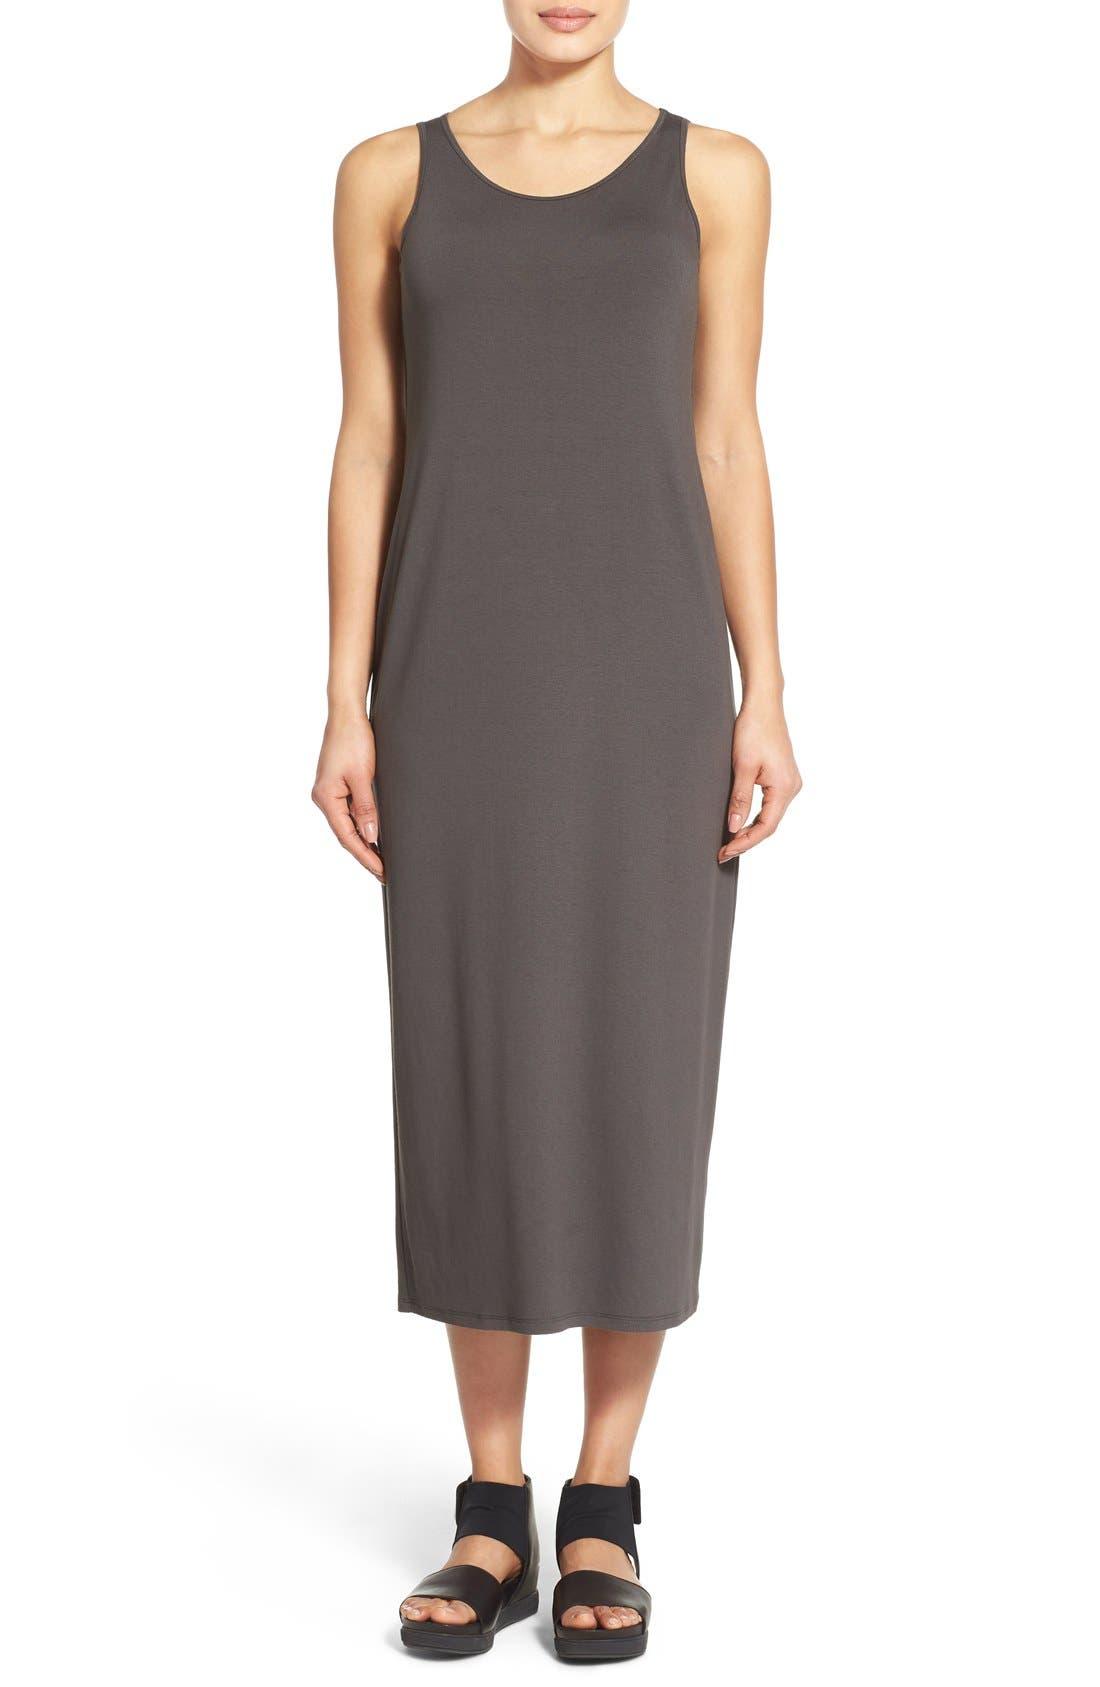 Alternate Image 1 Selected - Eileen Fisher Scoop Neck Jersey Midi Dress (Regular & Petite)